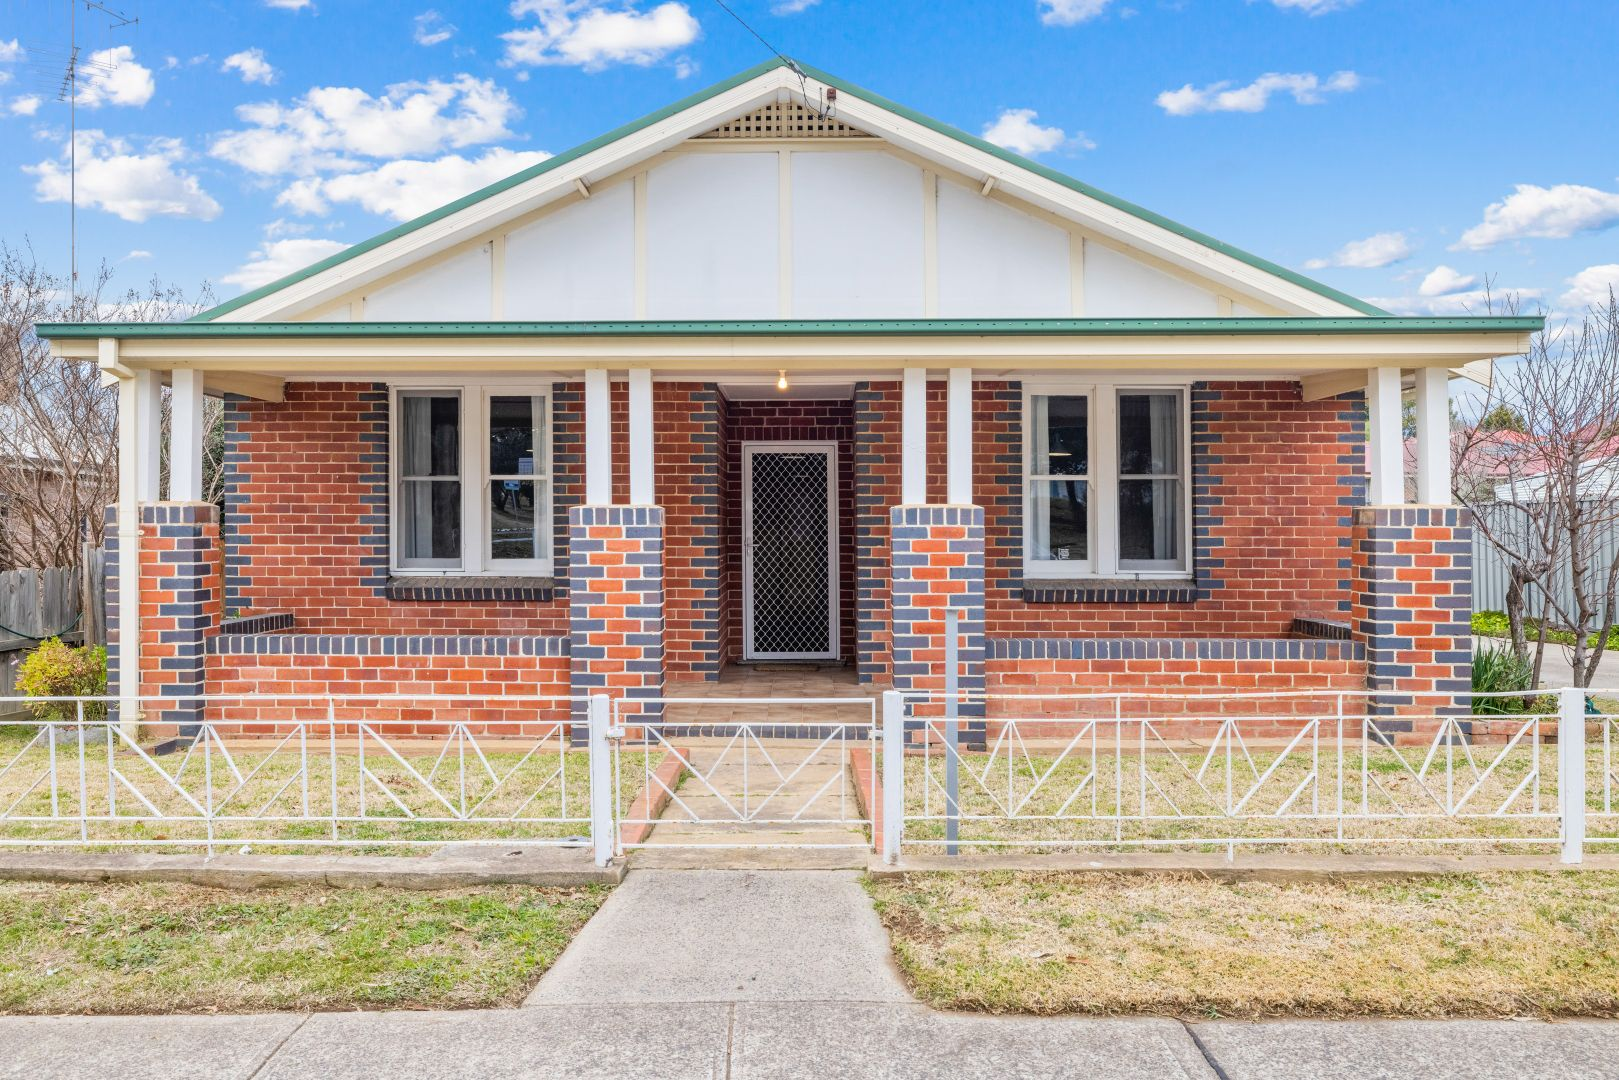 153 & 153a Faithfull Street, Goulburn NSW 2580, Image 1